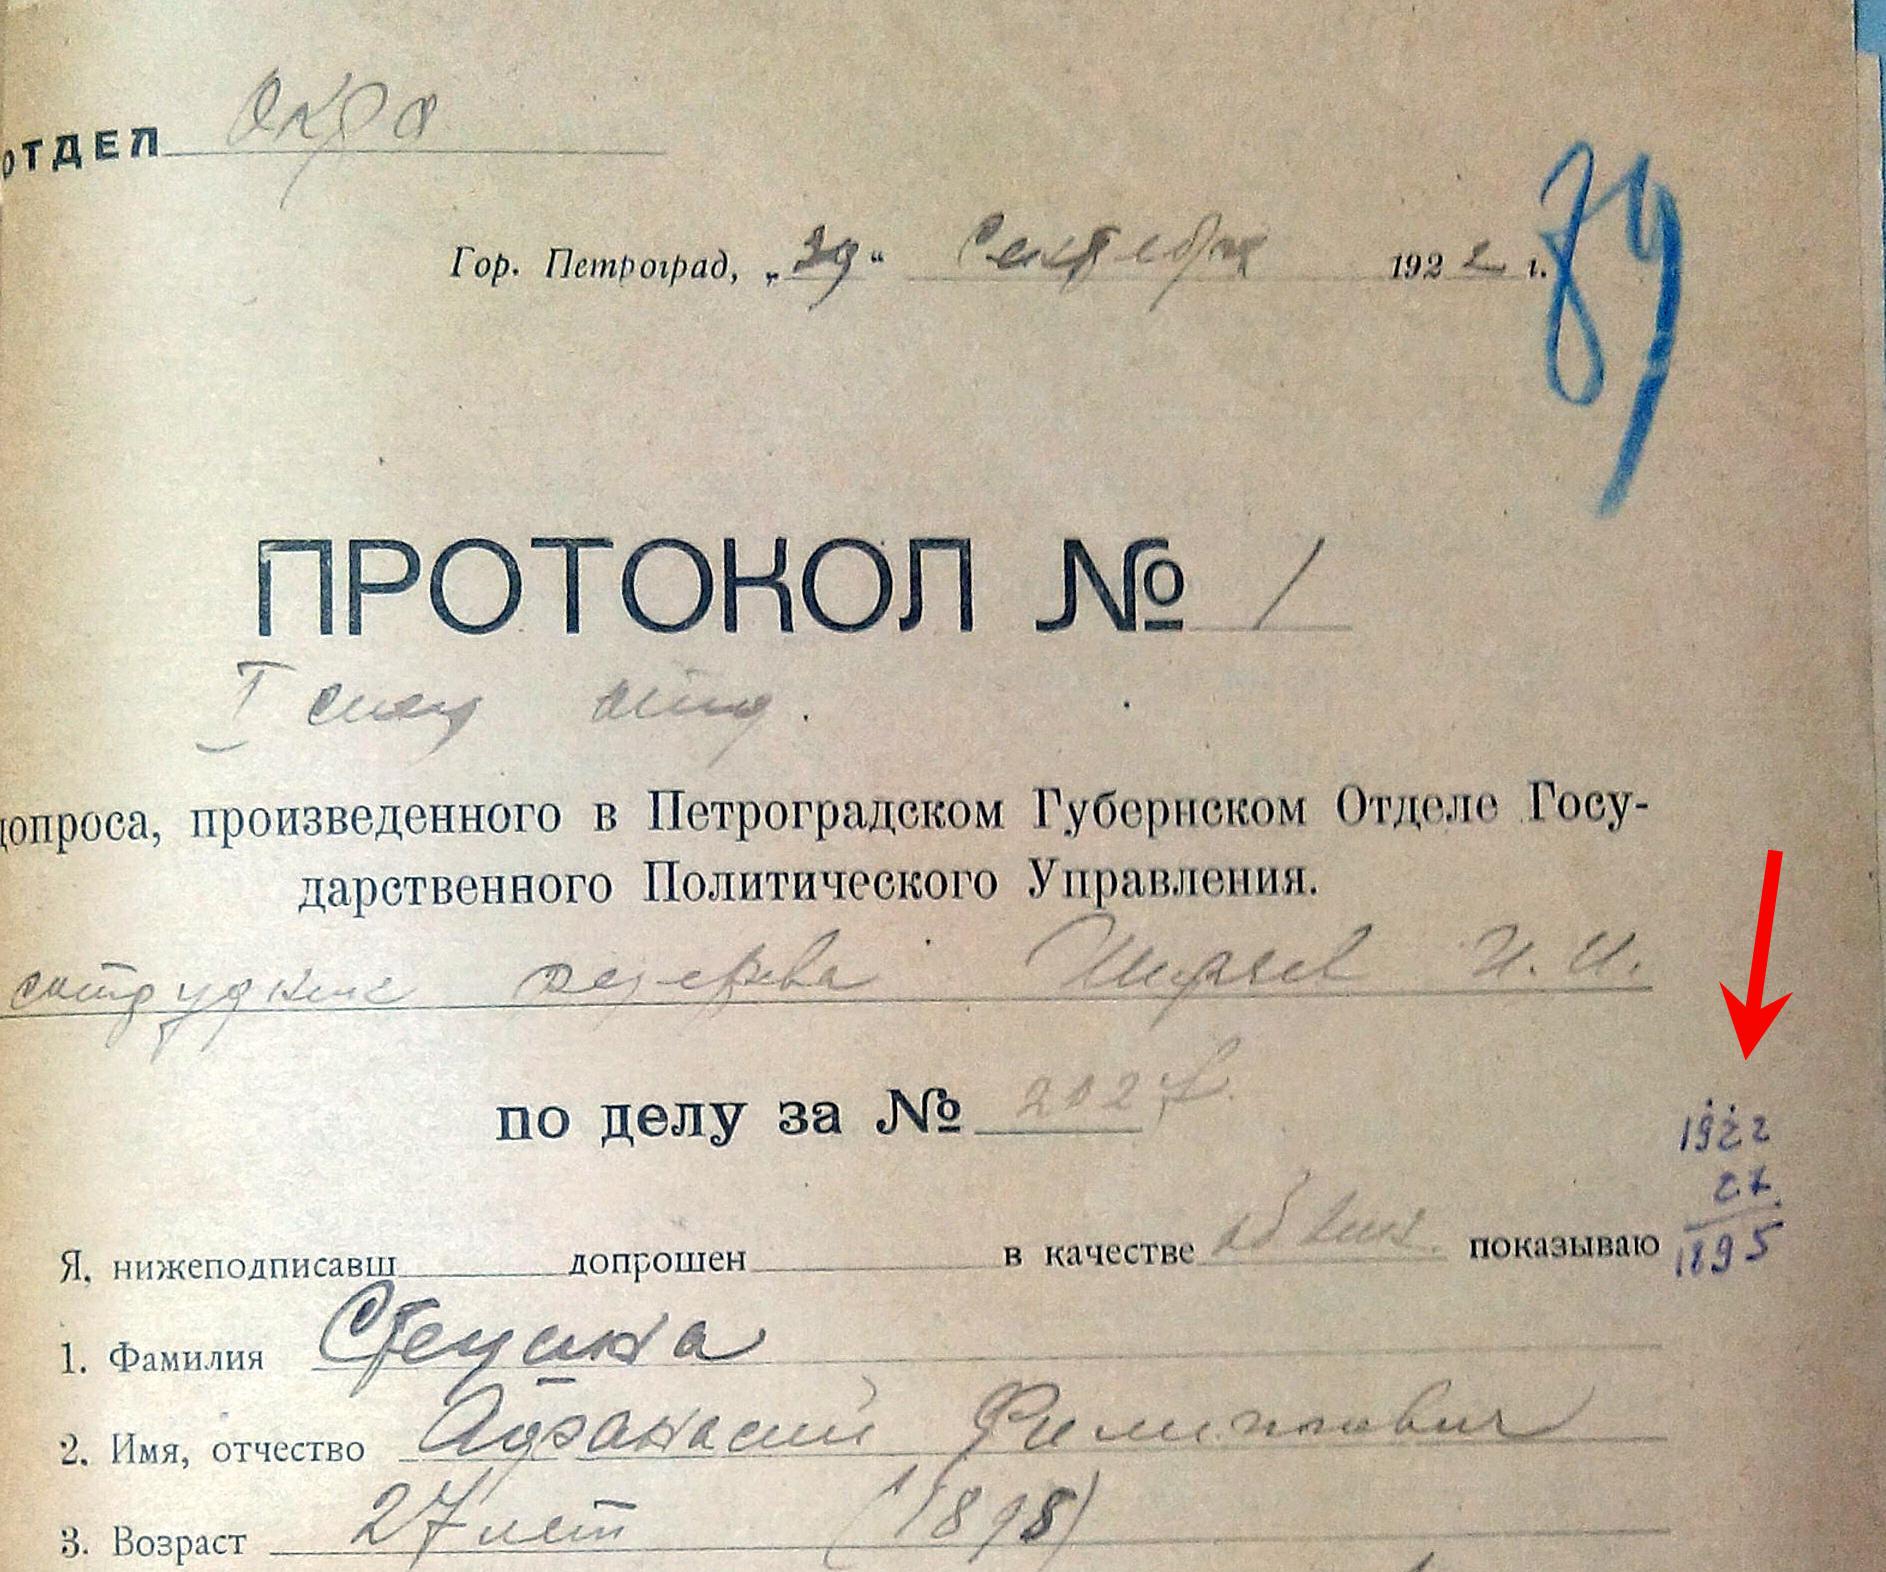 http://images.vfl.ru/ii/1544089578/0f7ab472/24492922.jpg